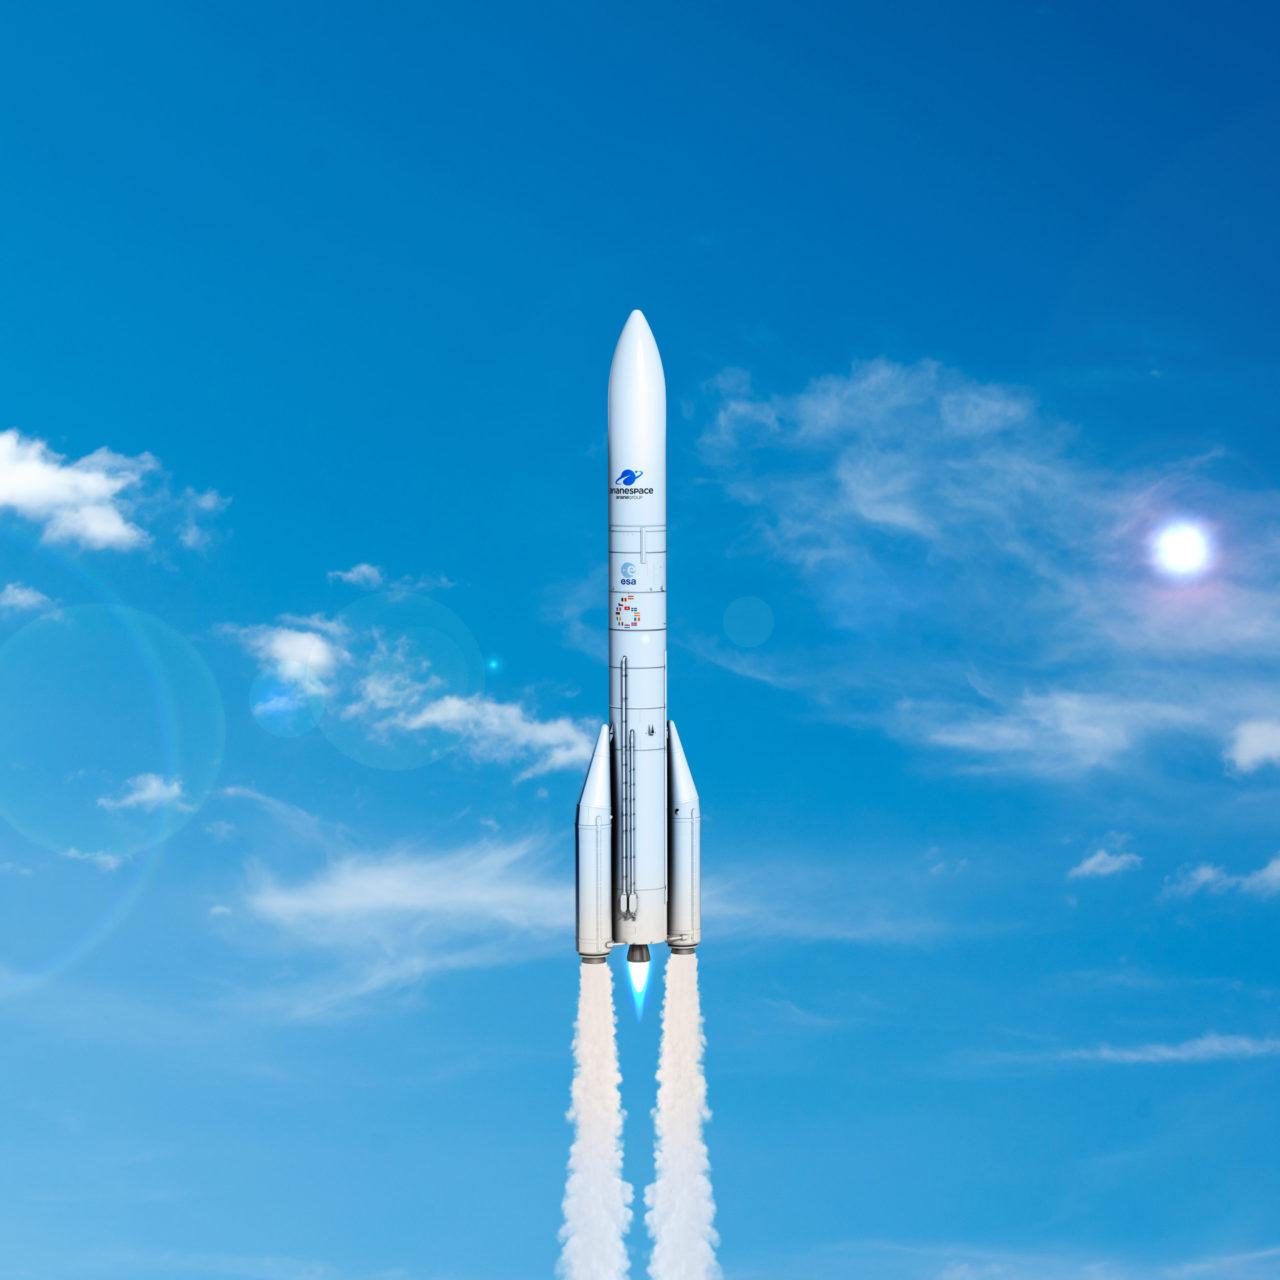 Ariane 6, centerpiece of the 69th International Astronautical Congress (IAC) in Bremen (October 1–5, 2018)